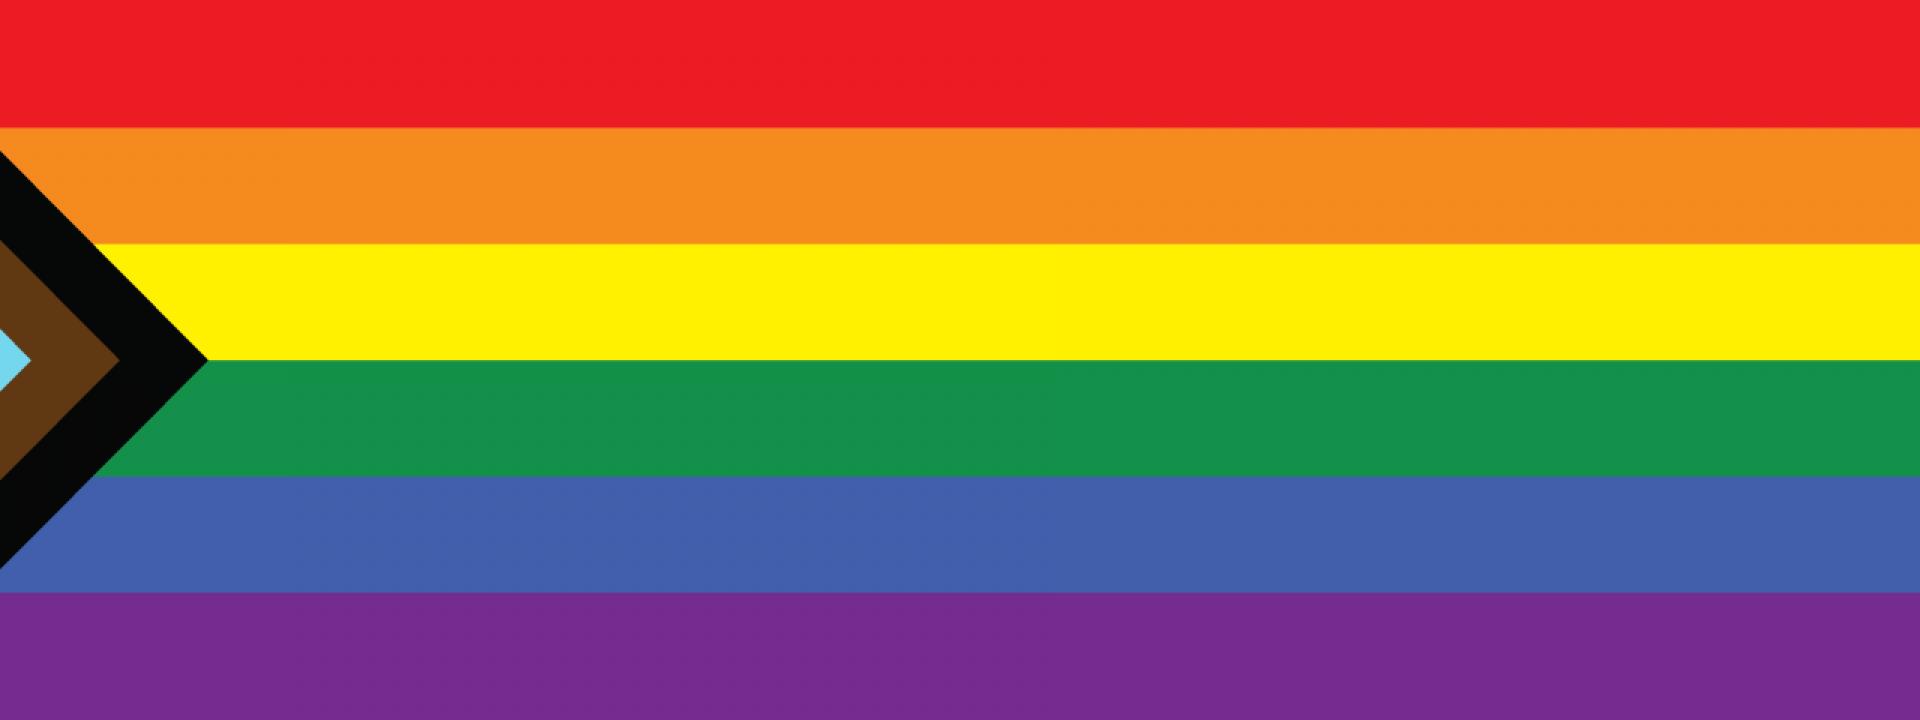 Athens Pride Week – Ένα DJ set στο ΚΠΙΣΝ - Εικόνα